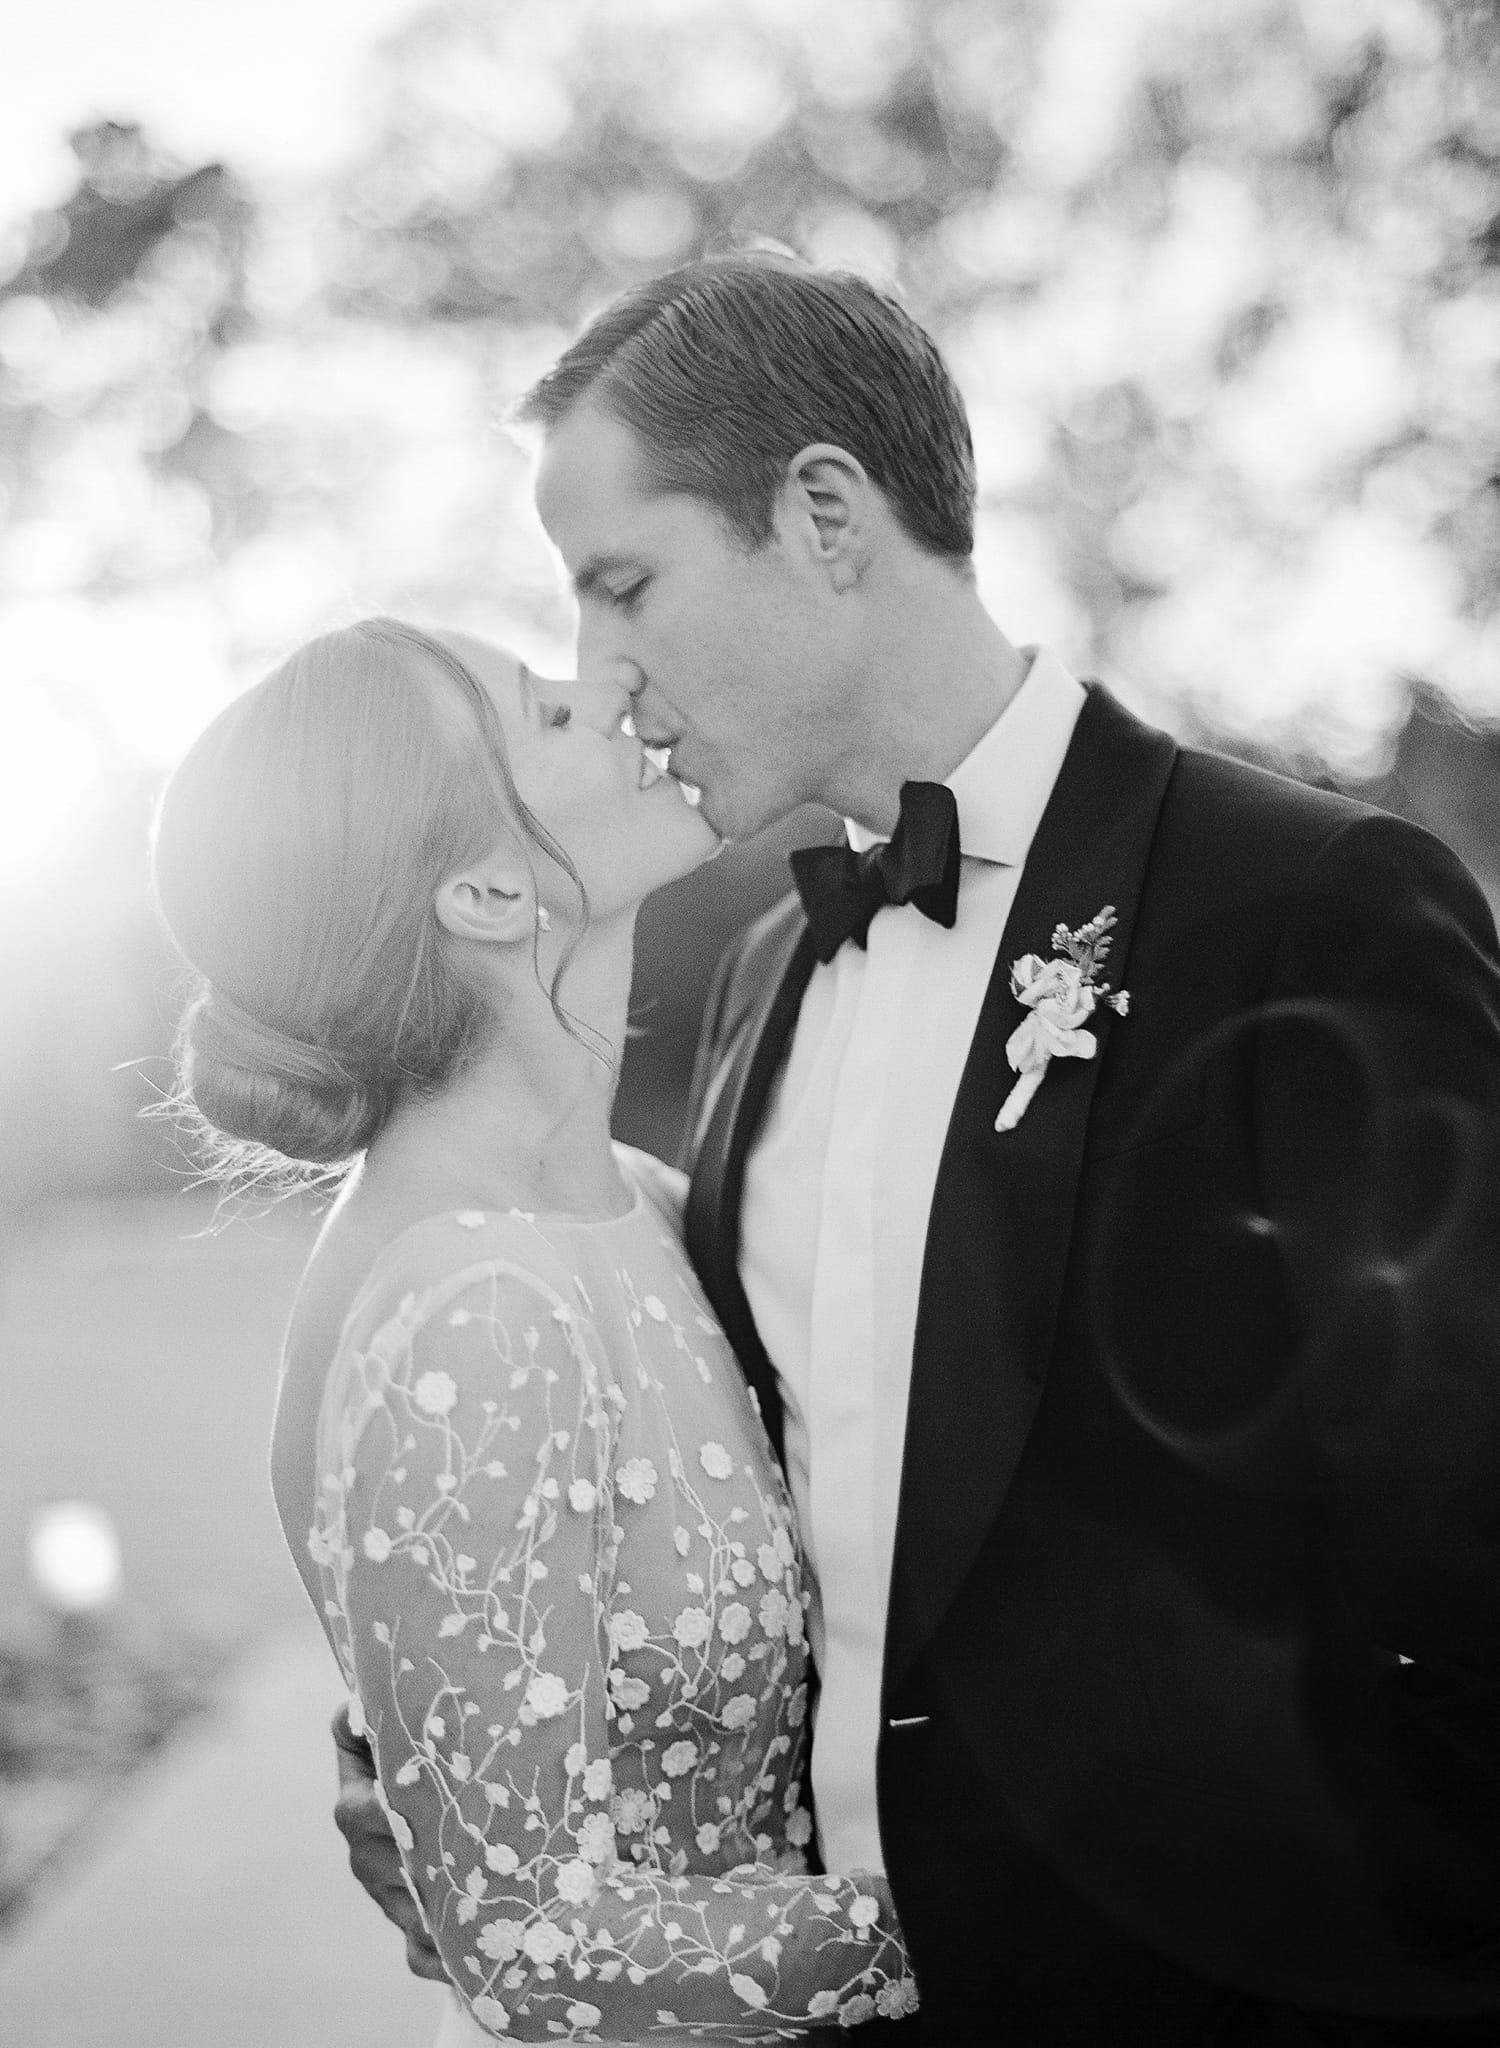 PROSPECT_HOUSE_WEDDING_AUSTIN_TX_MATTHEW_MOORE-00794.jpg